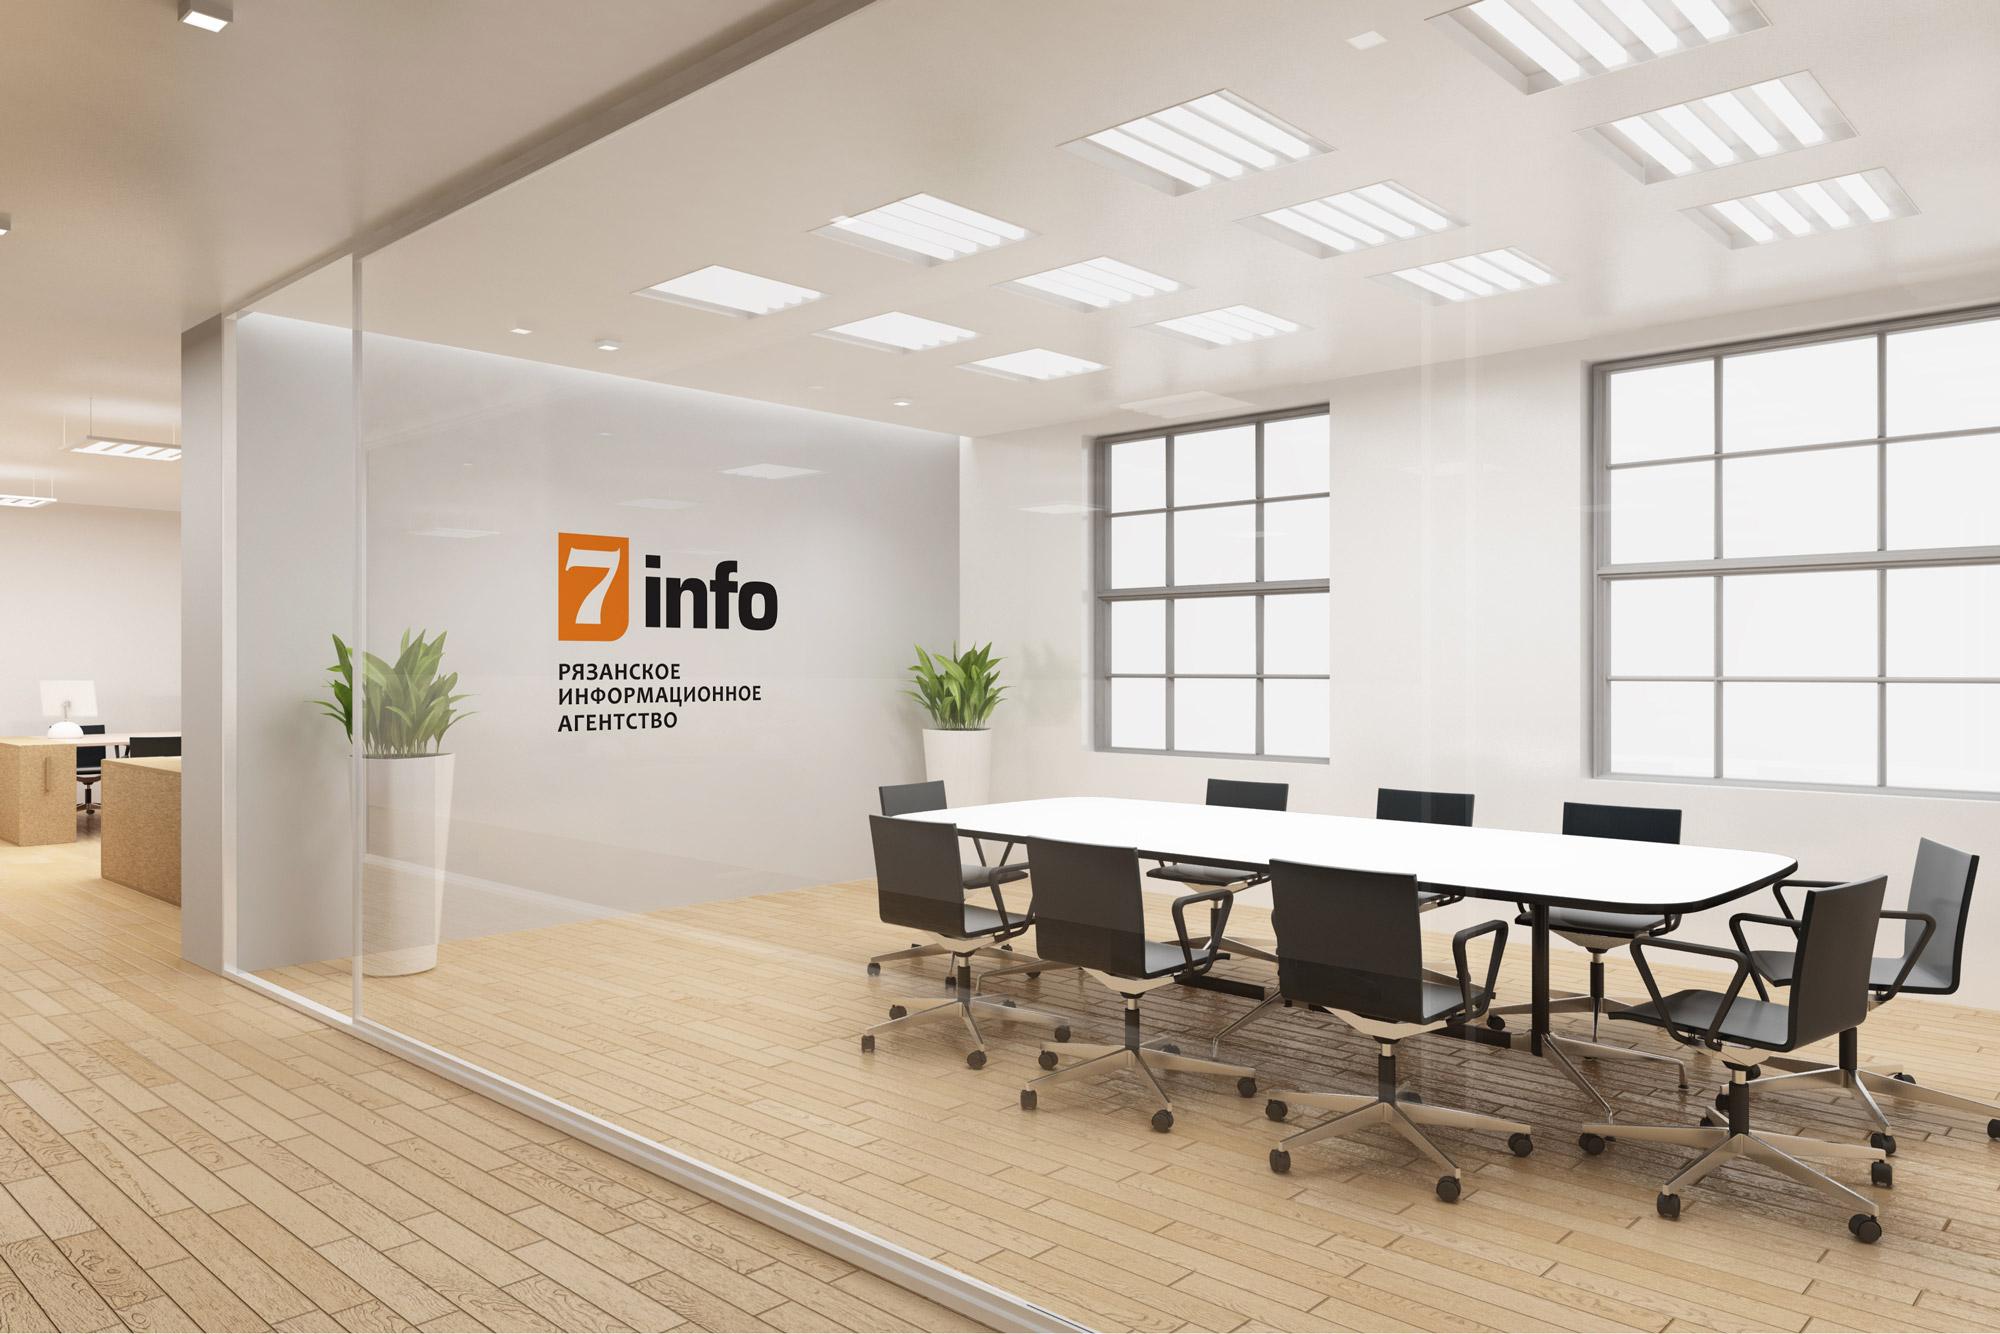 7 info - рефреш логотипа информационного агентства